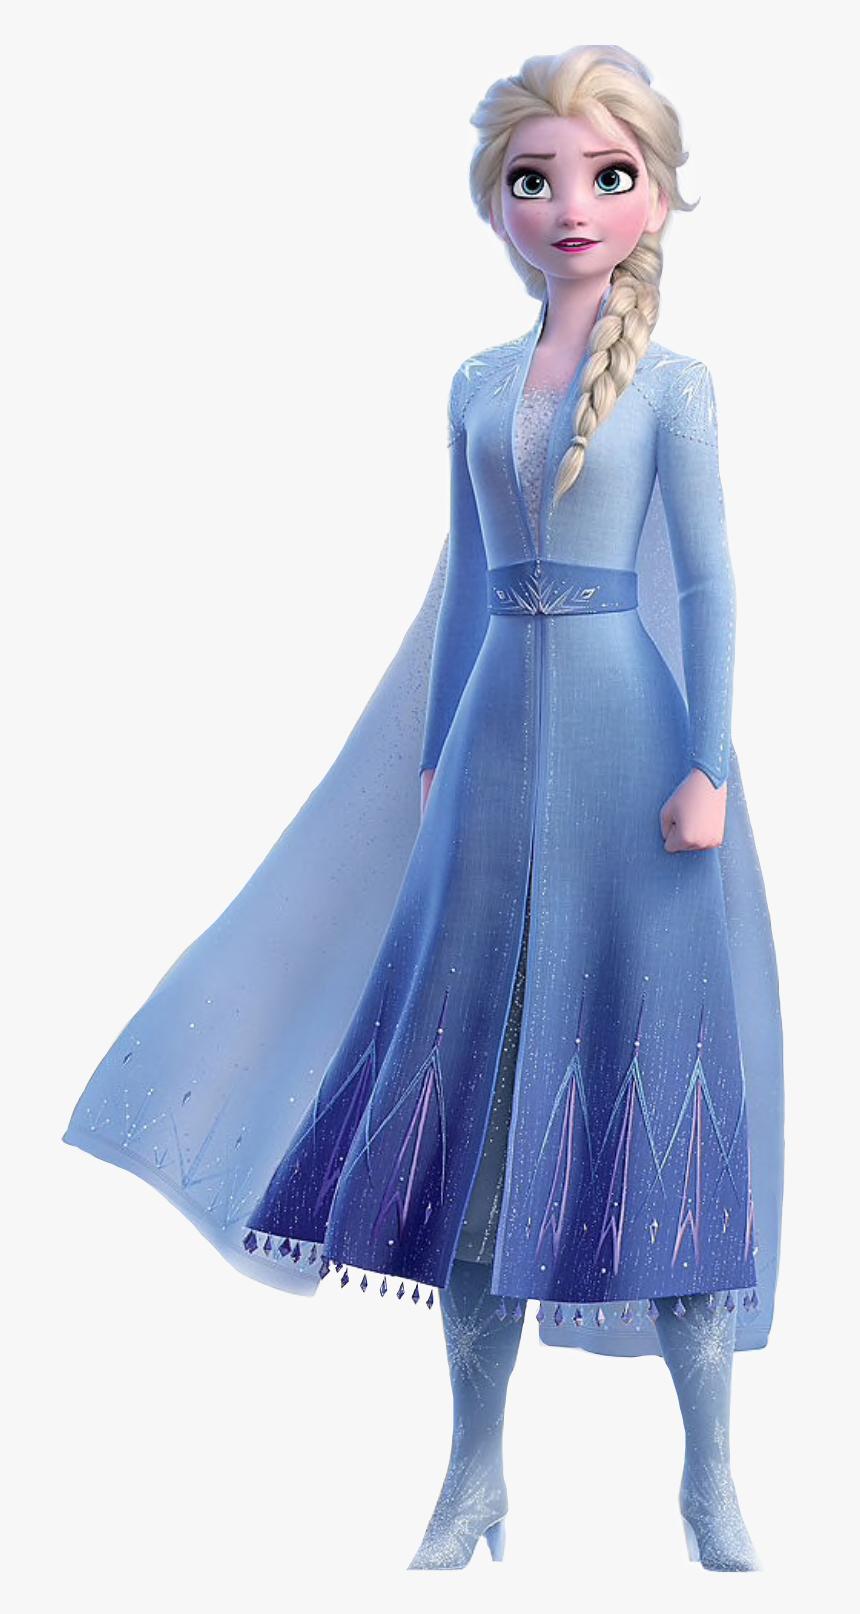 Frozen Frozen2 Elsa Anna Olaf Sven Lareinedesneiges Elsa Frozen 2 Png Transparent Png Is Free T In 2020 Elsa Frozen Frozen Pictures Disney Princess Wallpaper